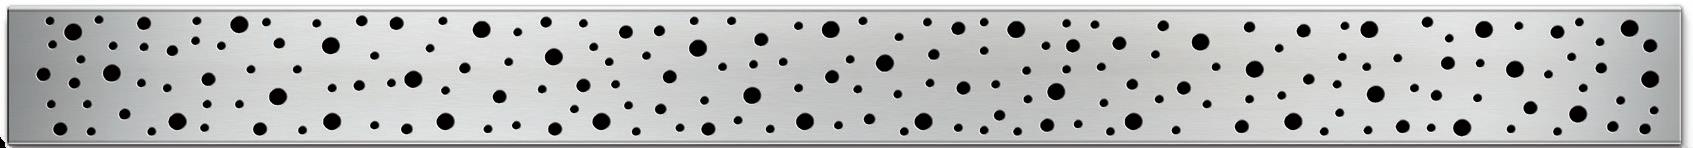 Водоотводящие желоба для монтажа к стене - drops-reshetka-glyanets - miroslav-chudej-s-r-o - 350-x-415 - 1-2 - 1 - 200 - czech-republic